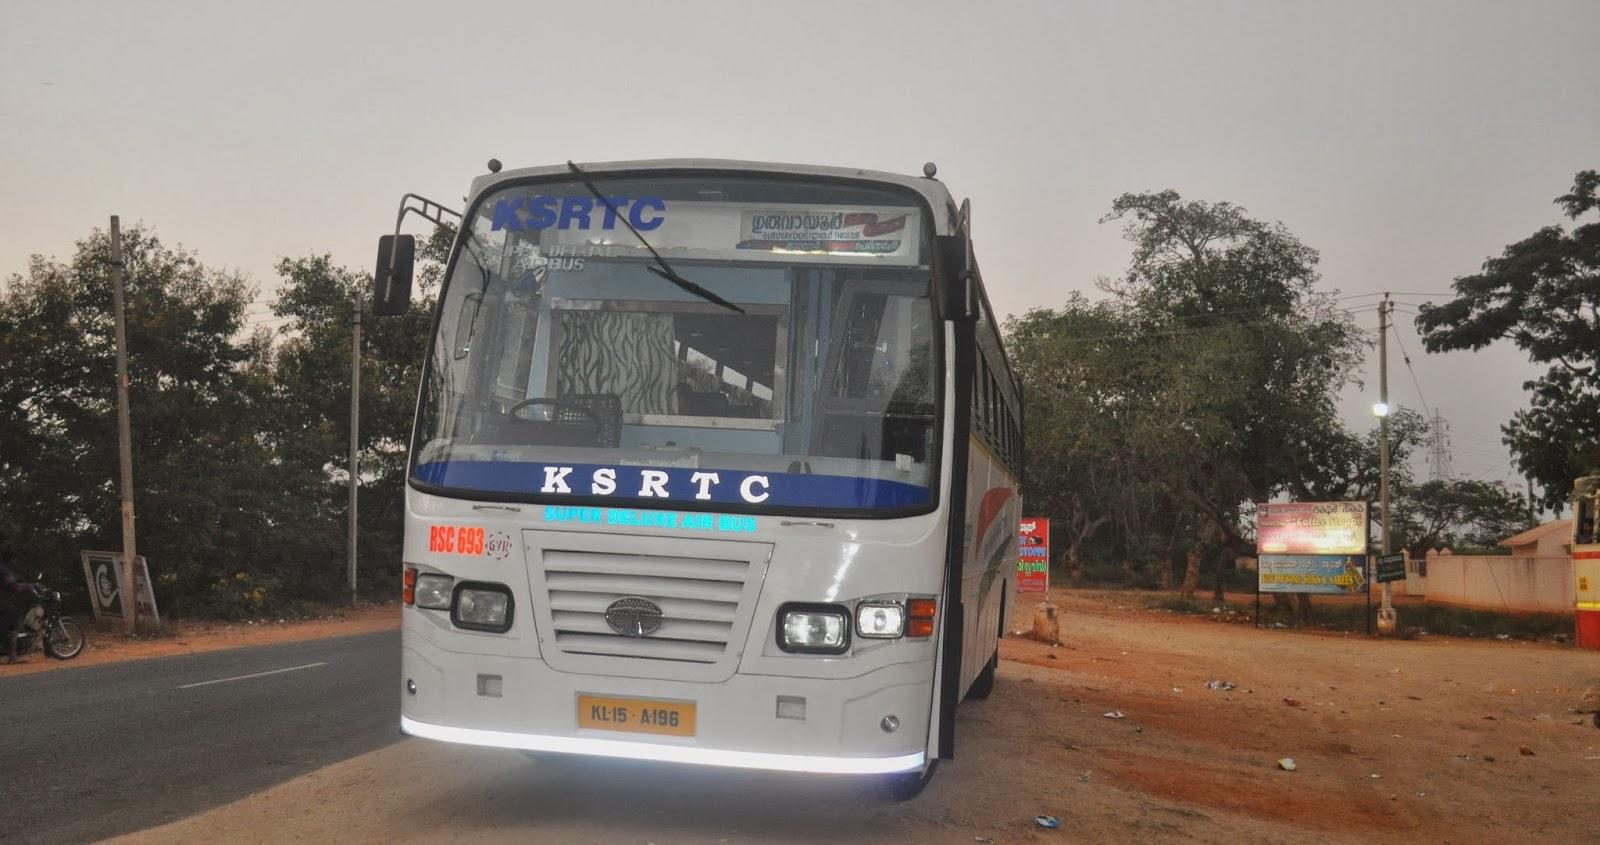 Travelyaari bus discount coupons